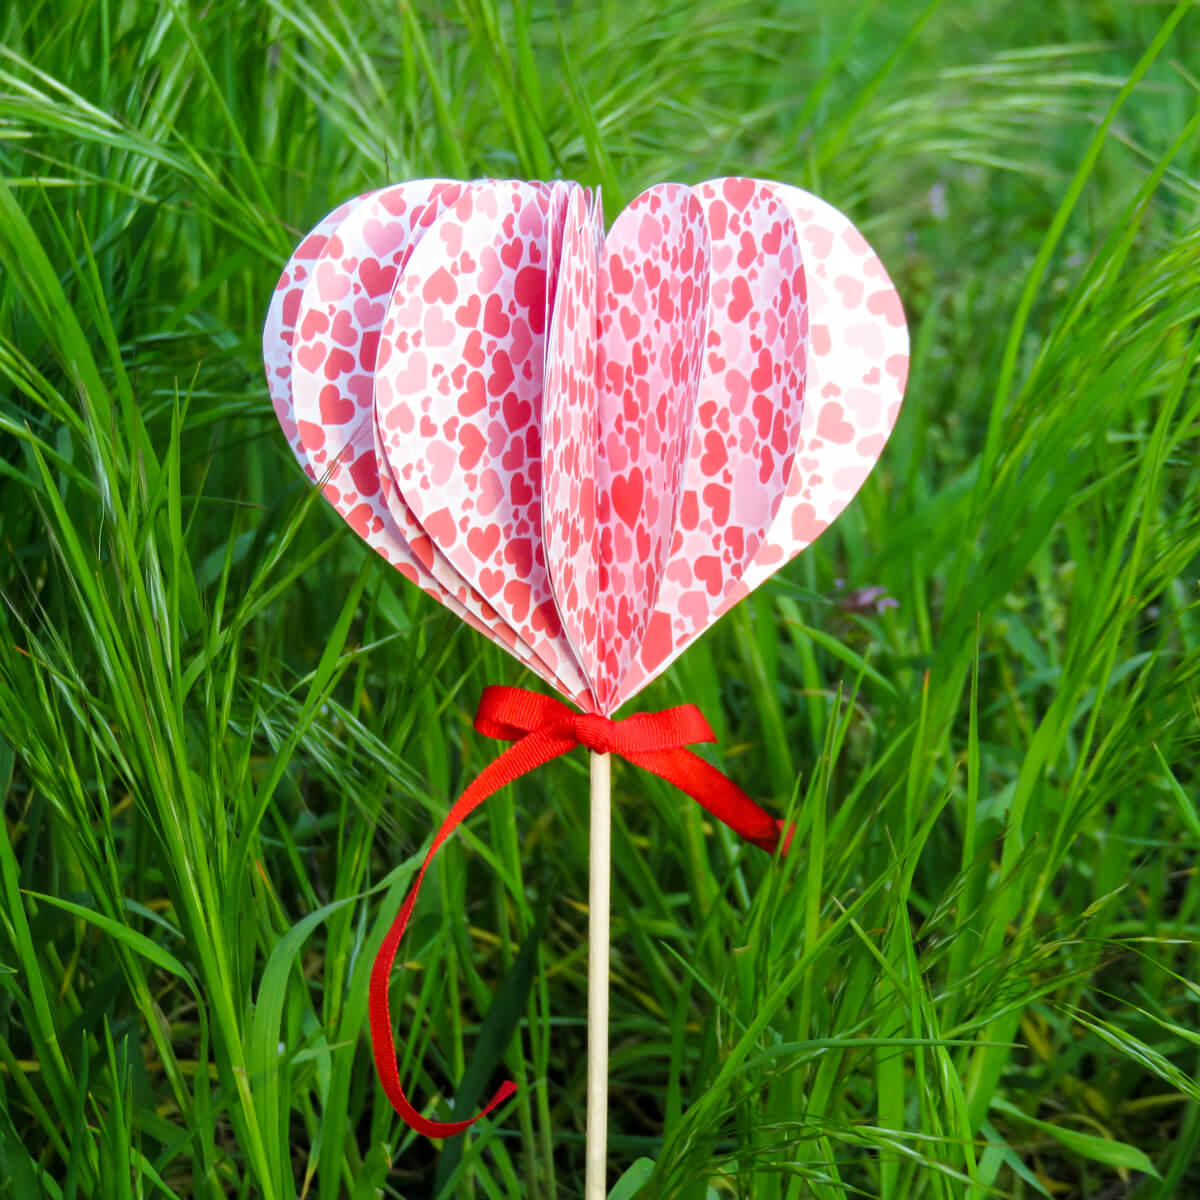 Srdcový zápich - Little BIG ART - Vyrobte si sami